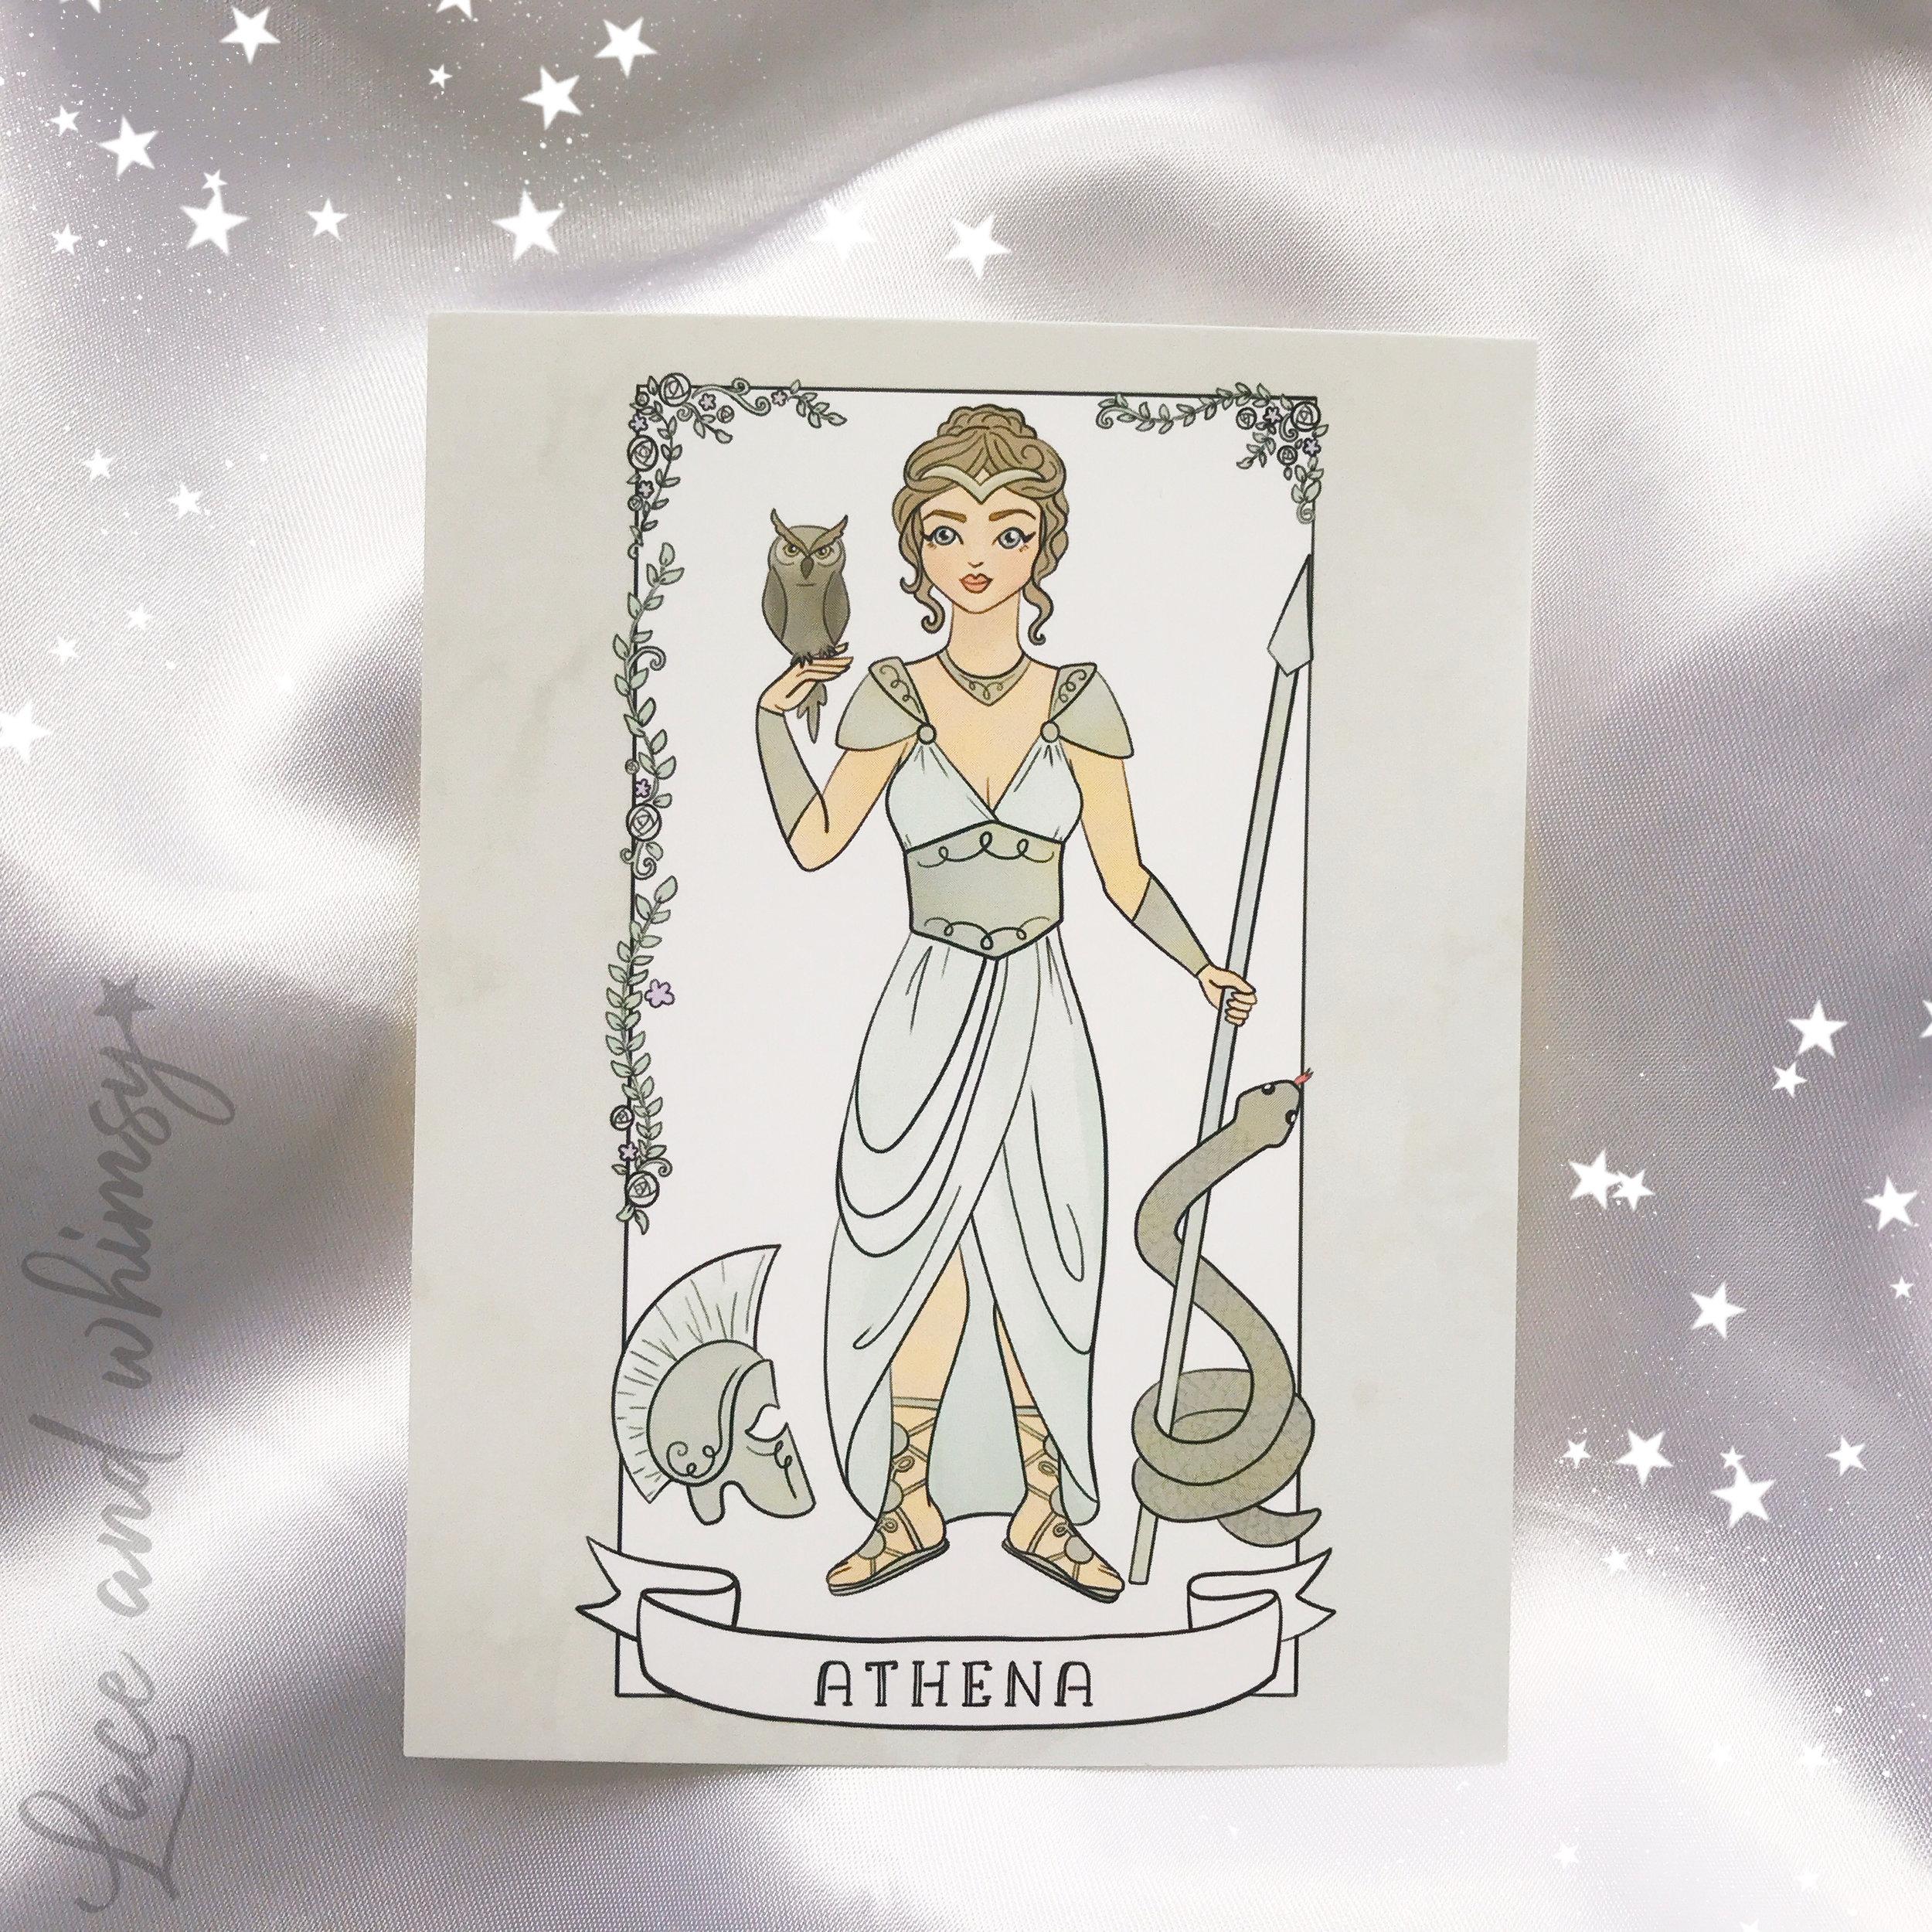 Athena - goddess of victory and wisdom.